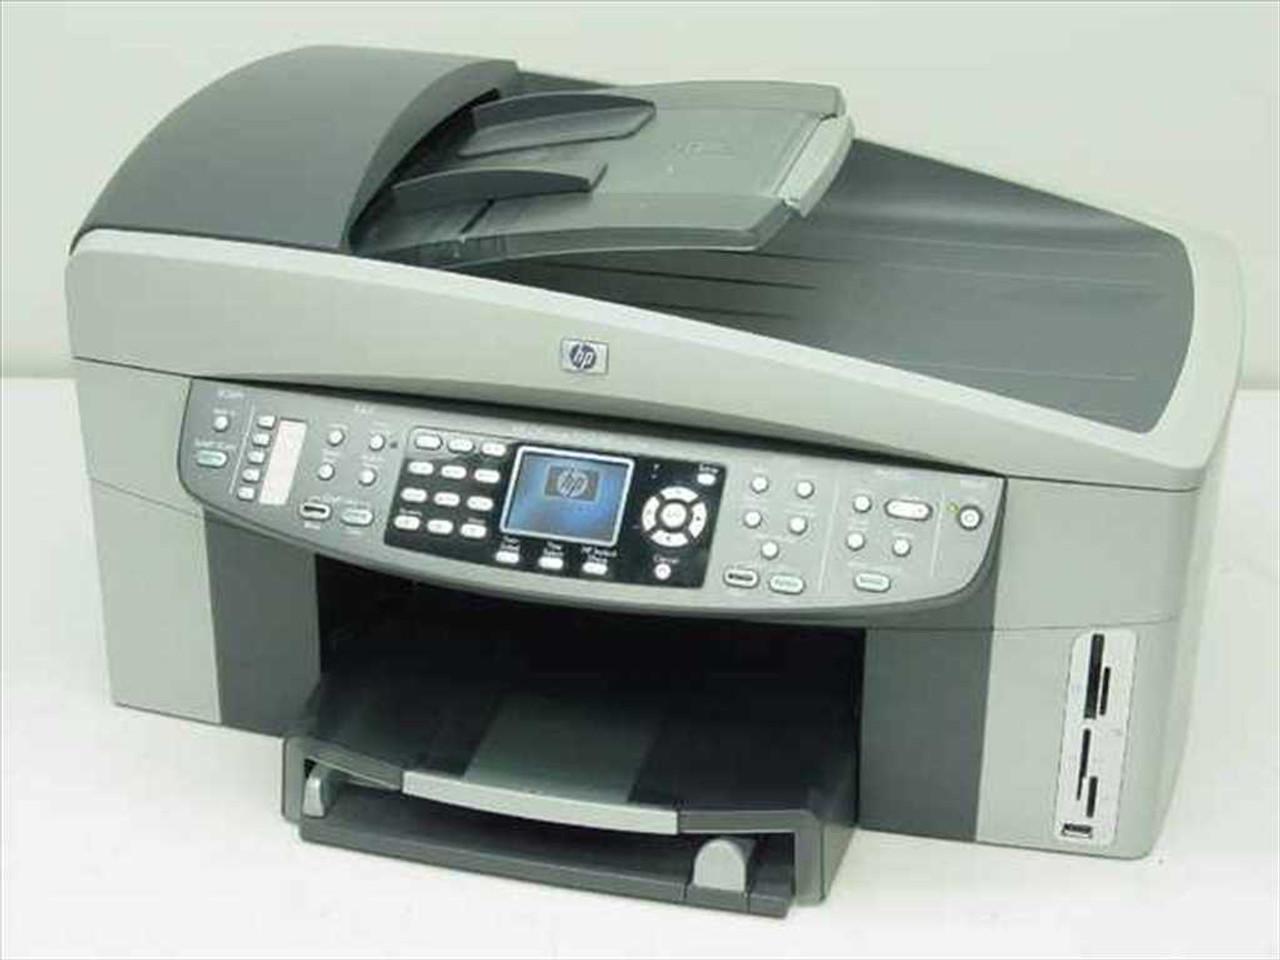 Hewlett Packard Q3461A HP OfficeJet 7310 All-in-One Printer Scanner w/Fee  ...